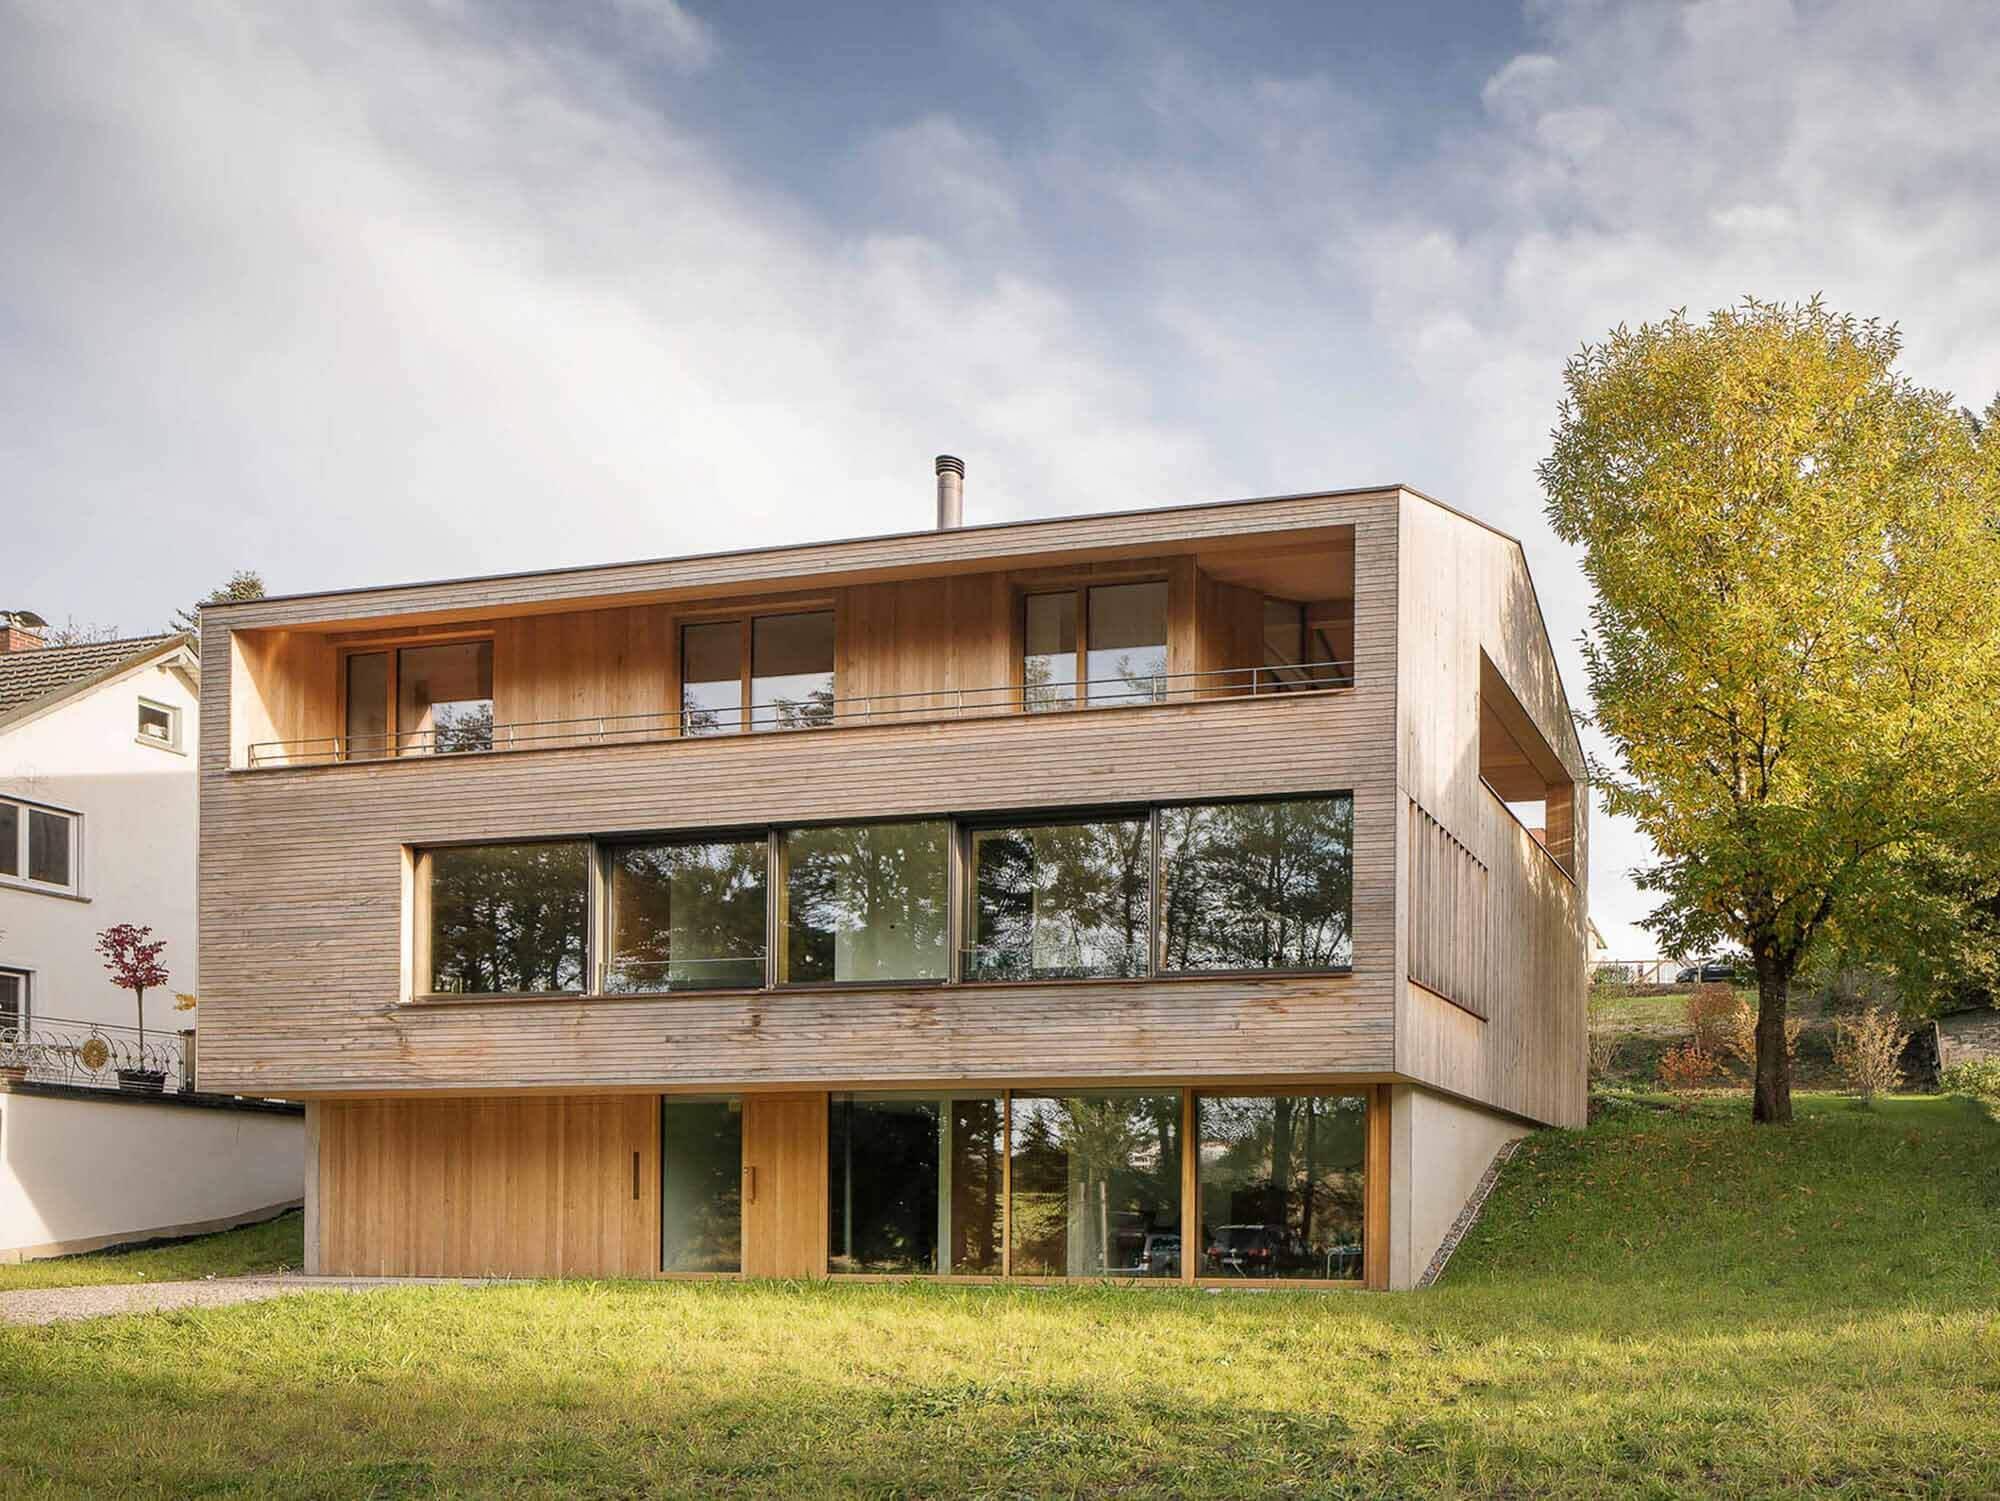 Дом П / Дитрих    Untertrifaller Architekten